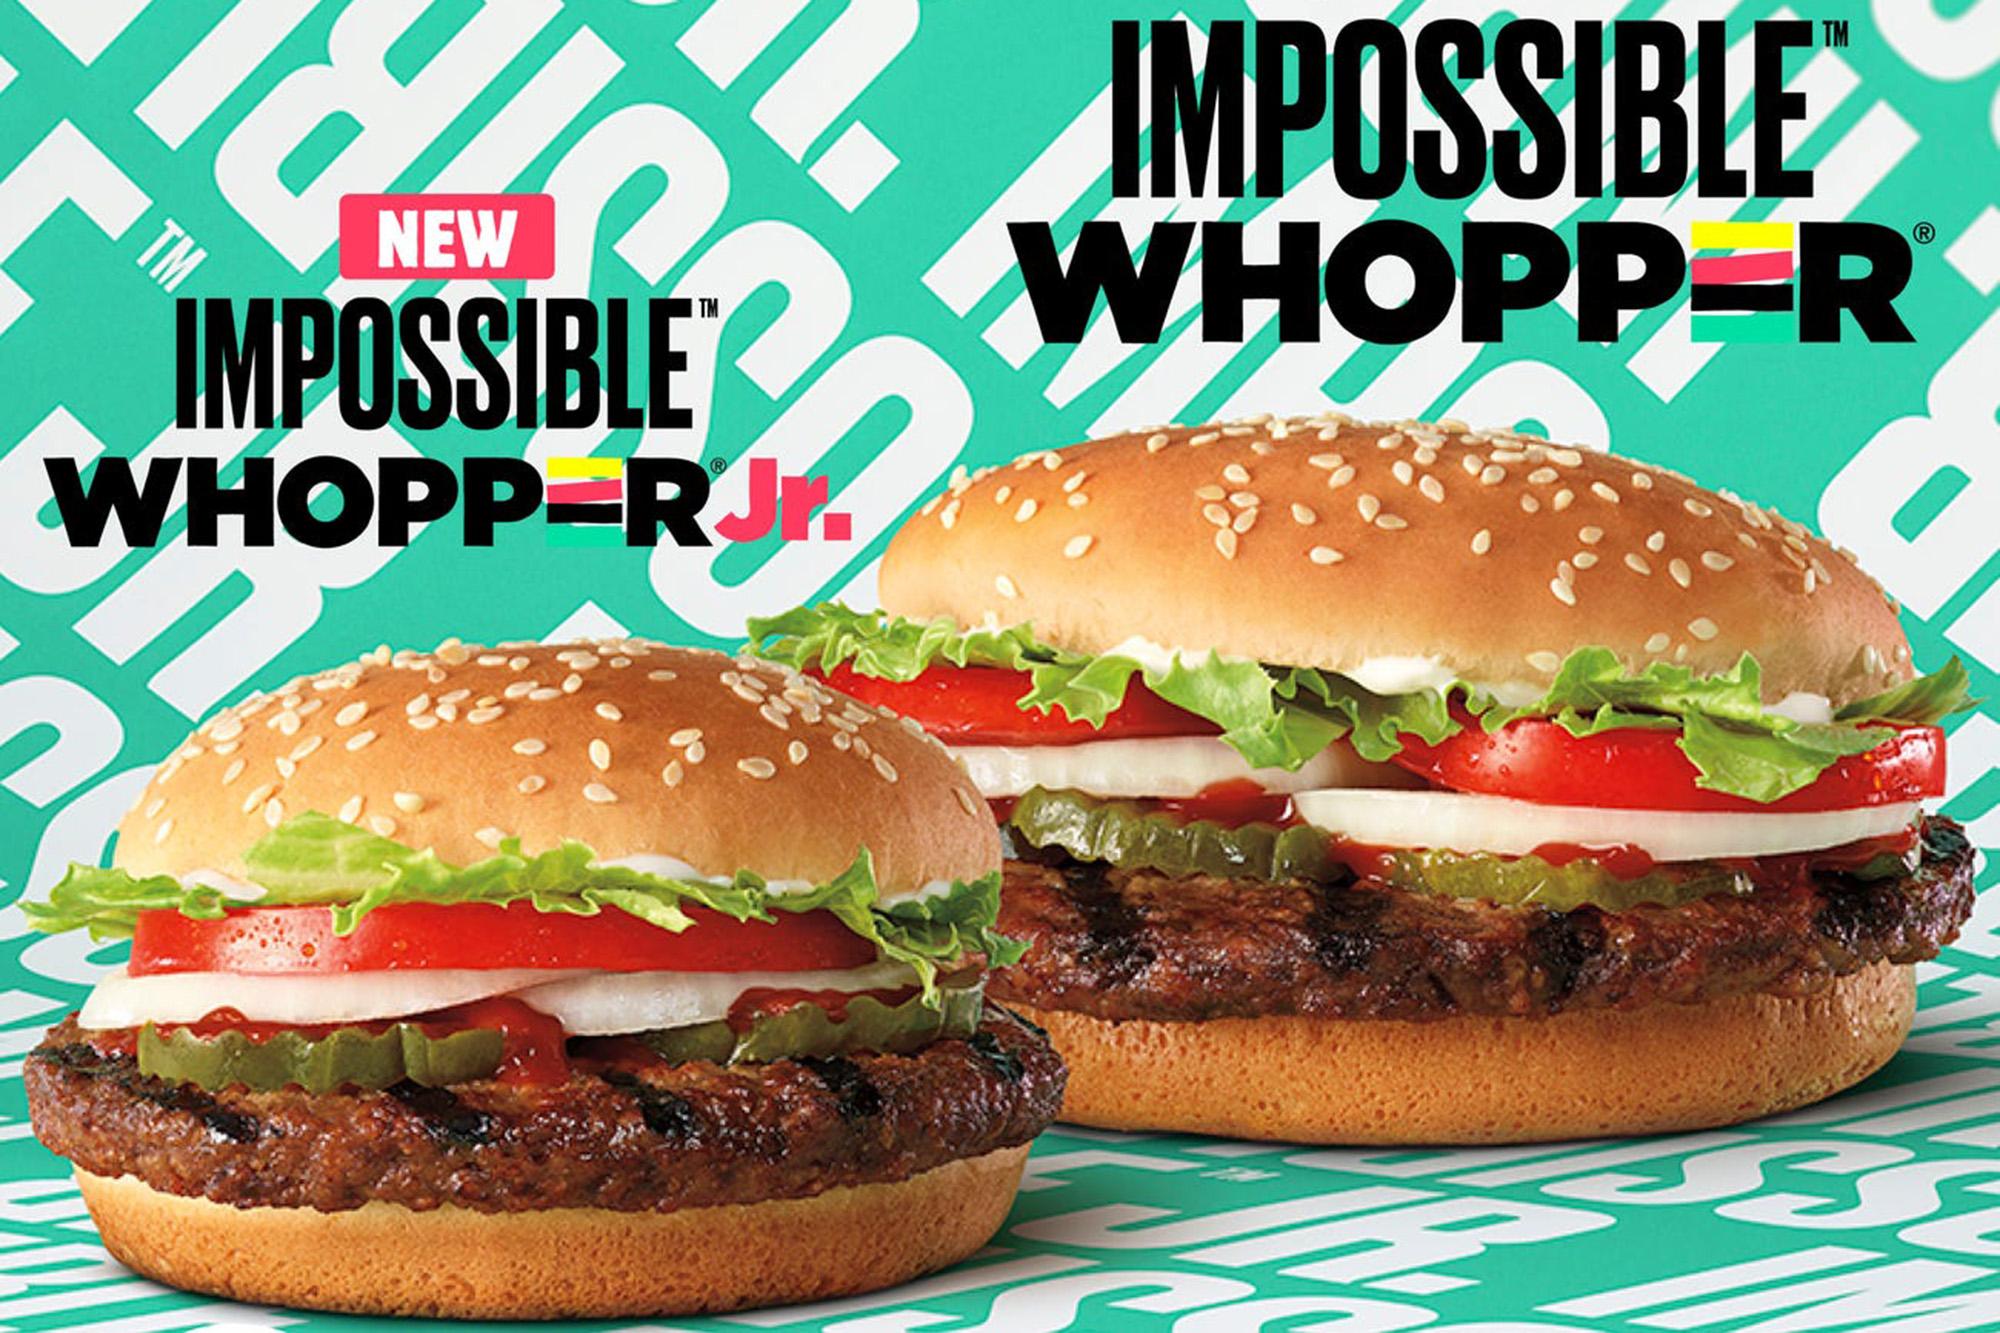 Burger King Expands Impossible Burger Menu To Kids Meals